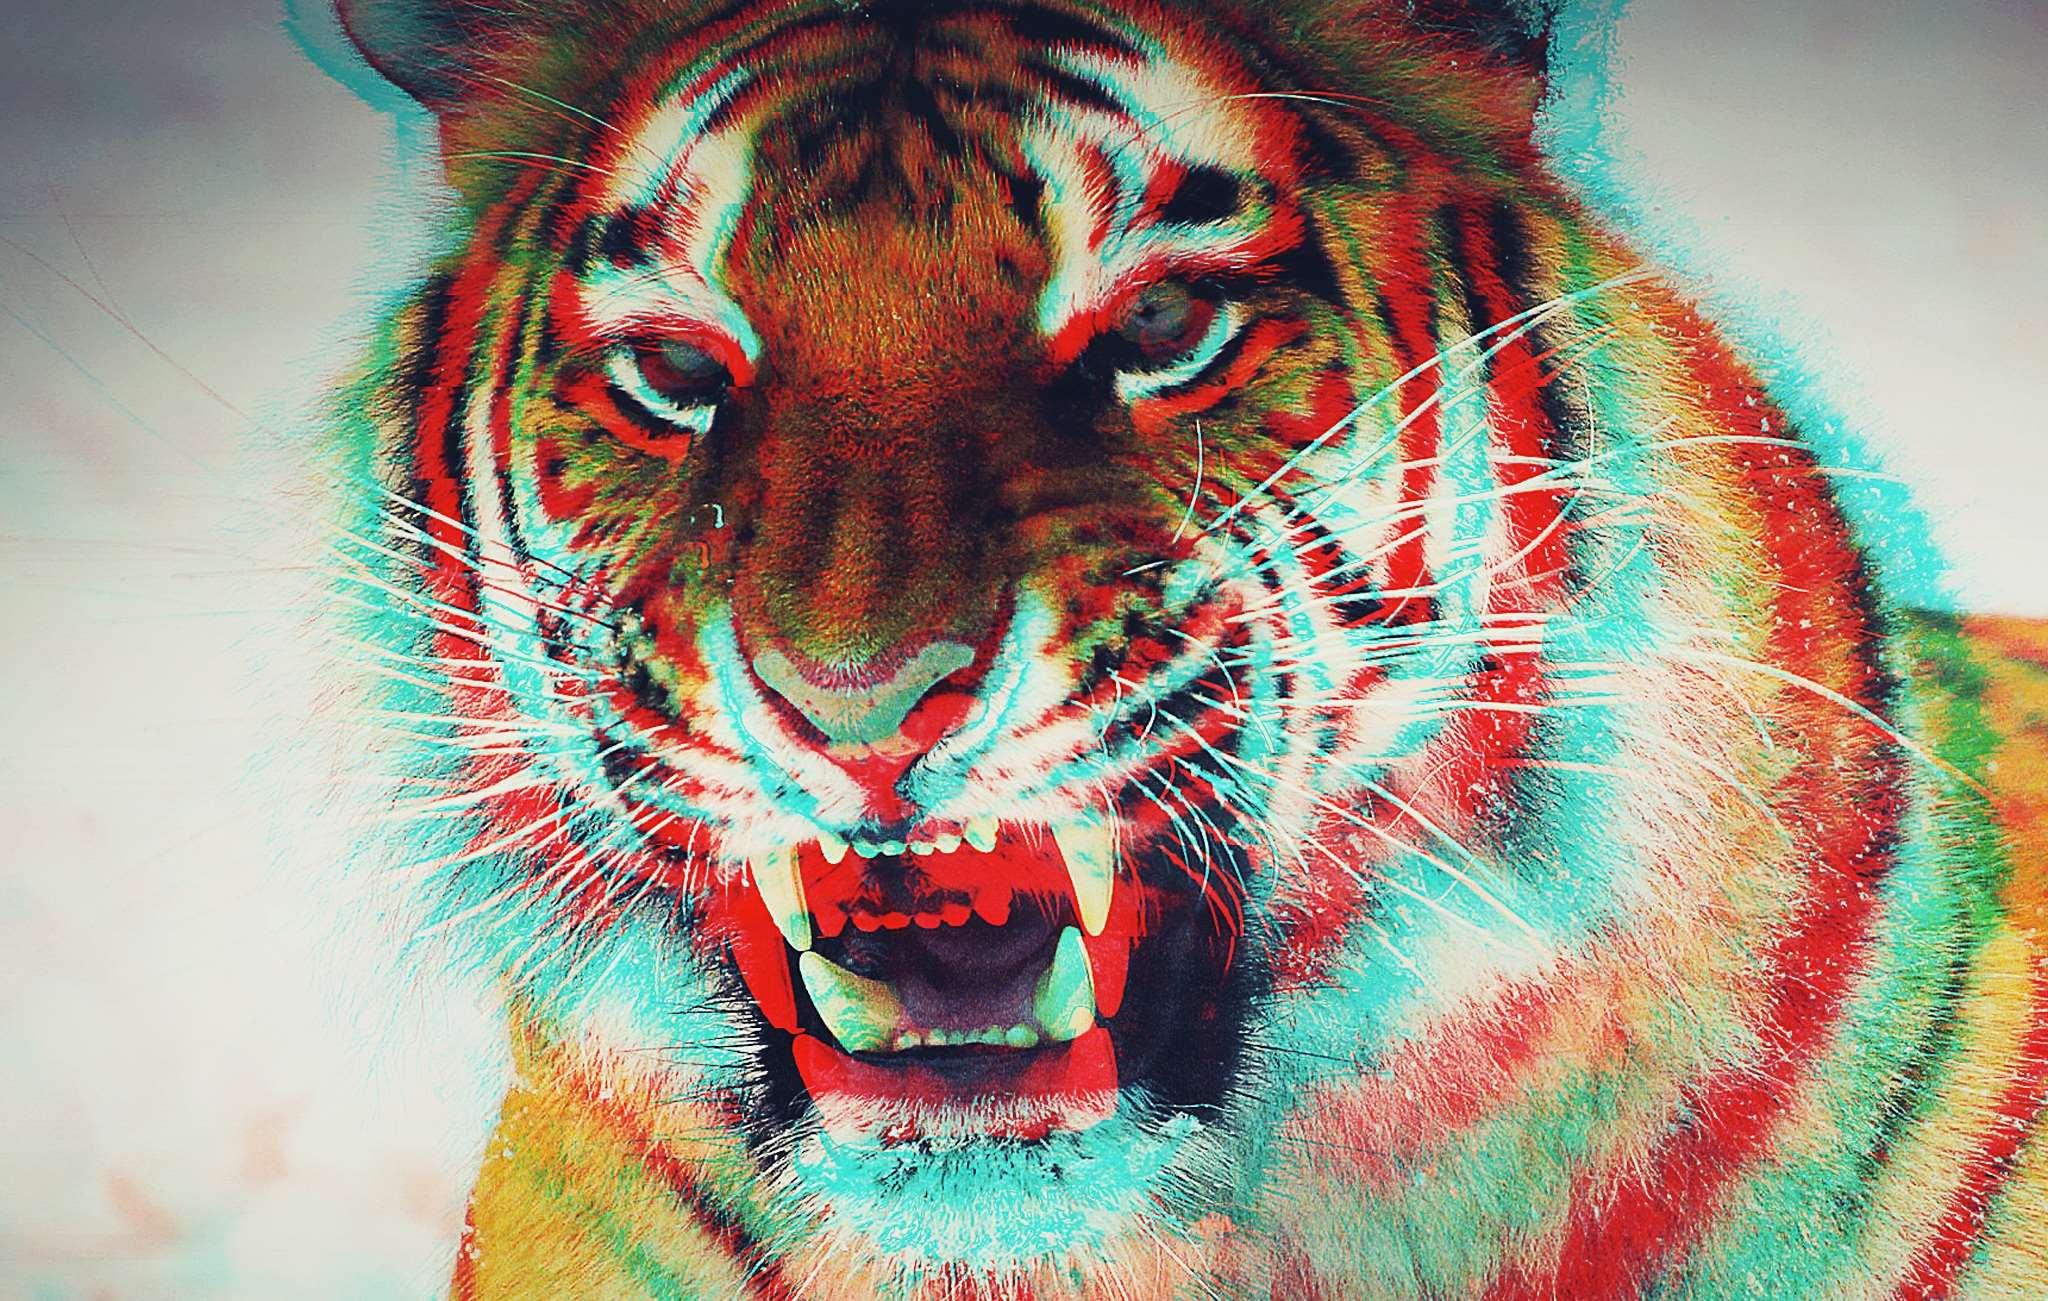 Colorful Tiger Wallpaper Hd